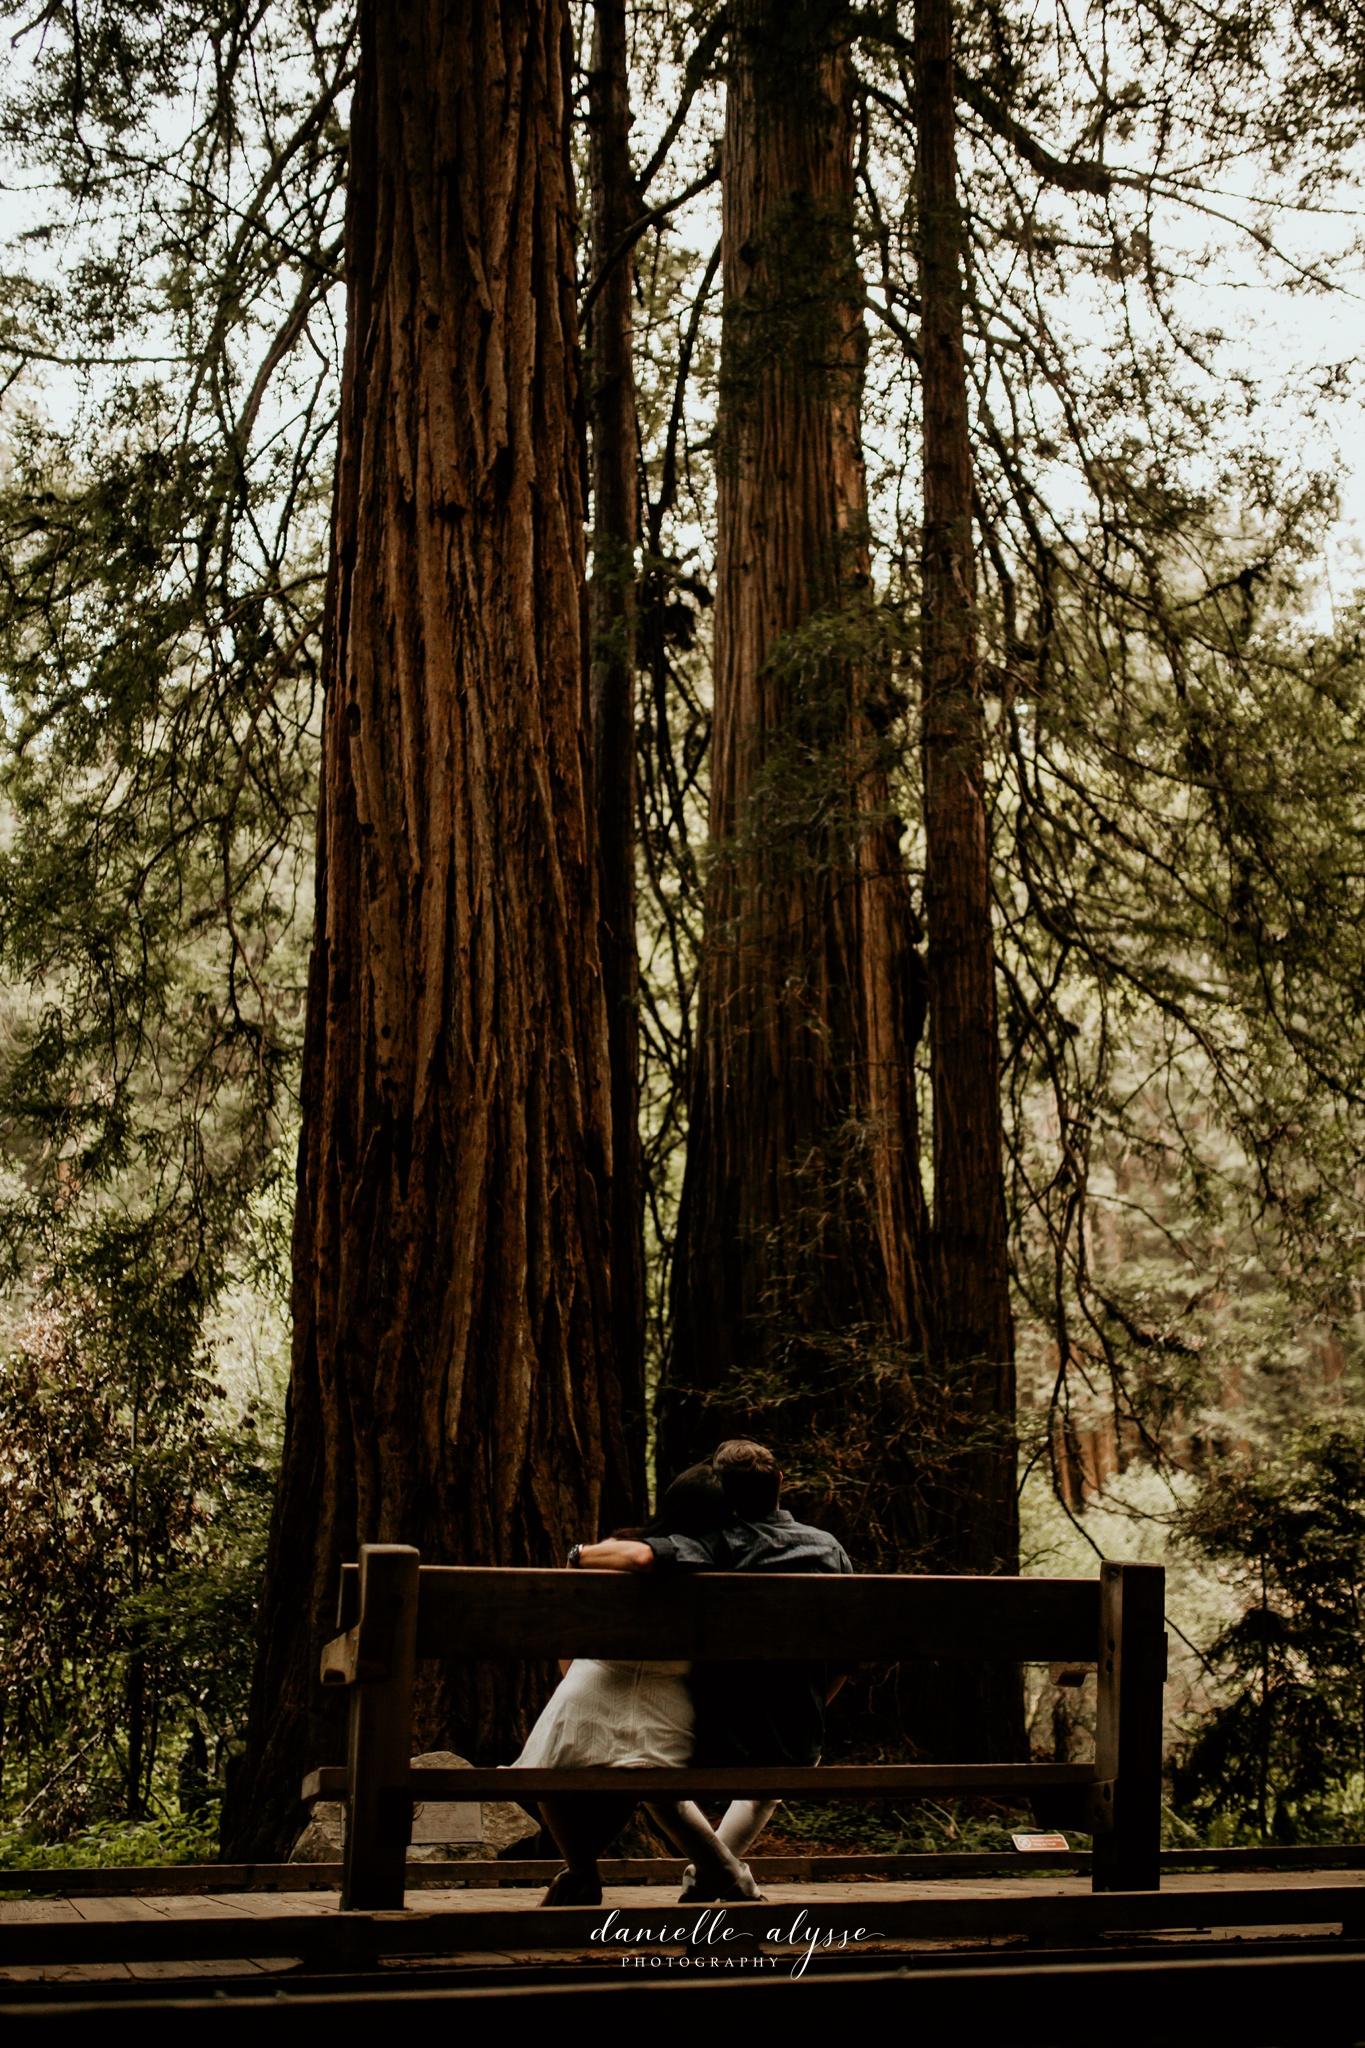 180503_engagement_bianca_muir_woods_mill_valley_danielle_alysse_photography_bay_area_photographer_blog_66_WEB.jpg